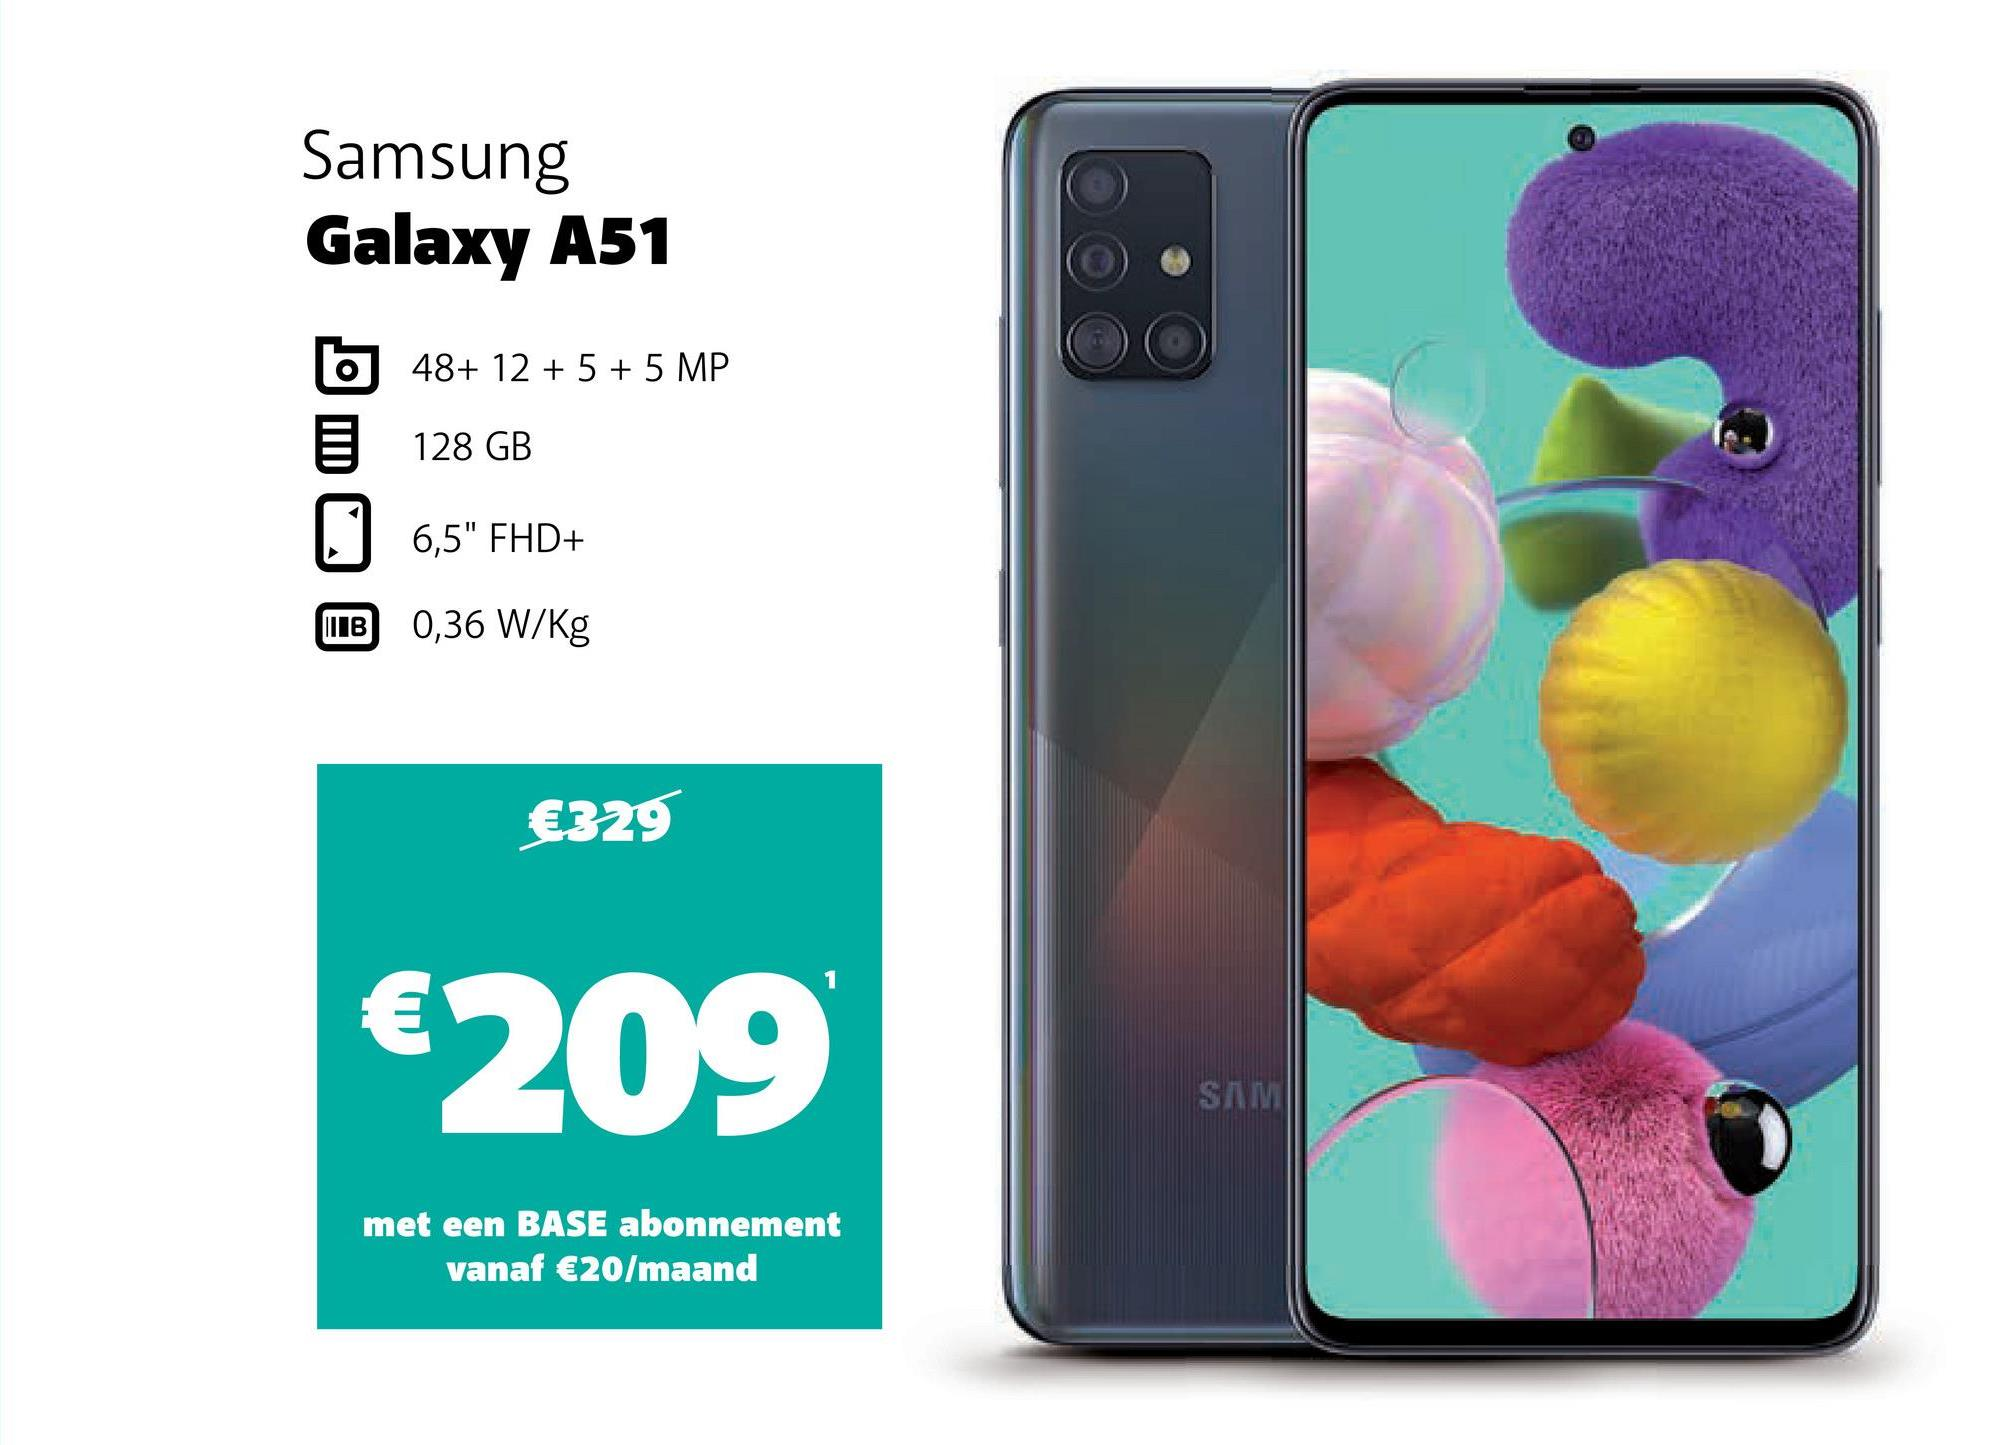 "Samsung Galaxy A51 48+ 12 + 5 + 5 MP 128 GB 6,5"" FHD+ LIB 0,36 W/kg €329 1 €209 SINI met een BASE abonnement vanaf €20/maand"